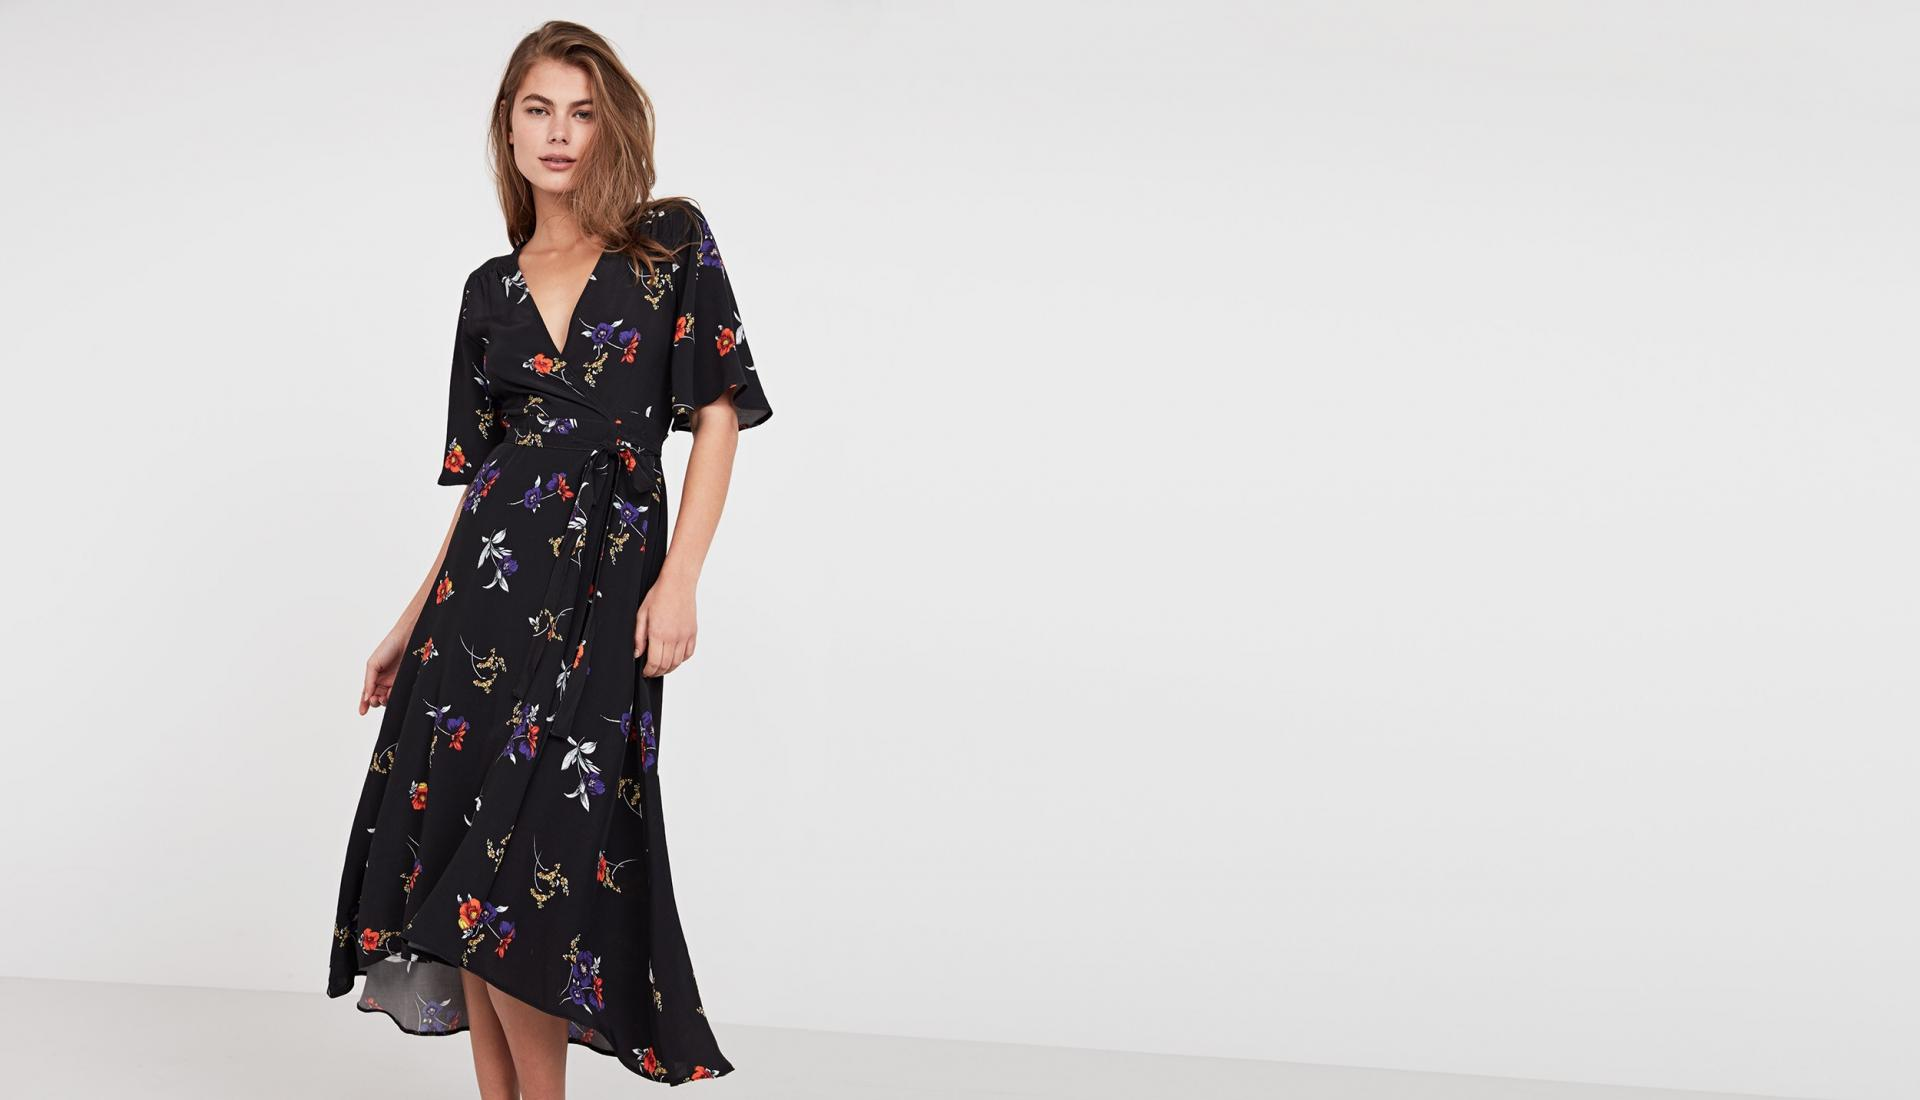 Floral Boho Style Dress